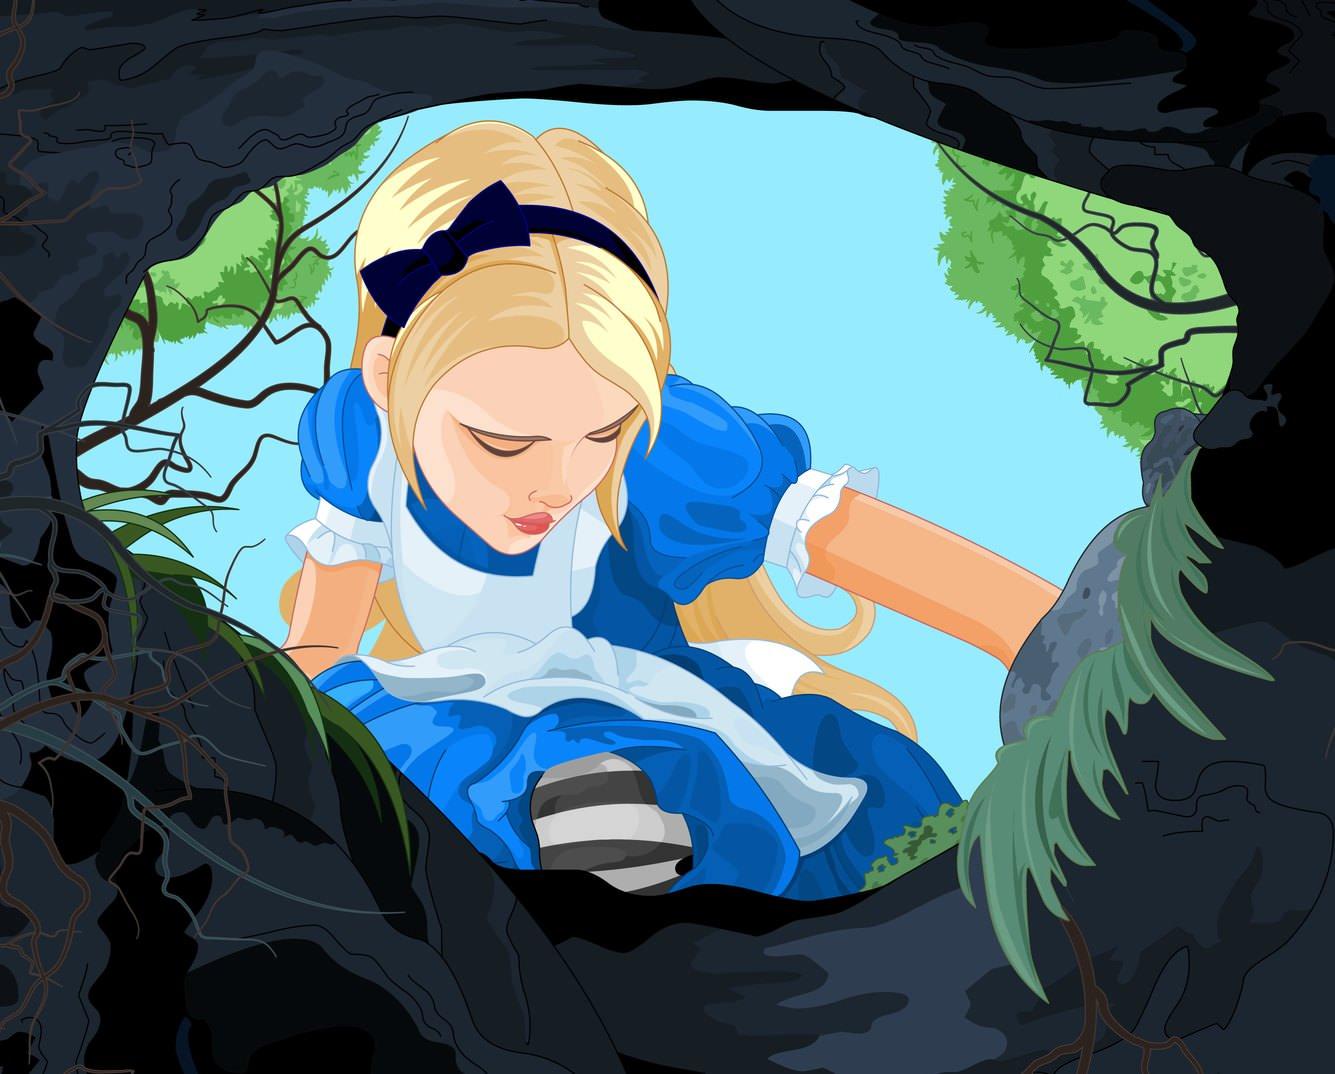 alice in wonderland rabbit hole.jpg